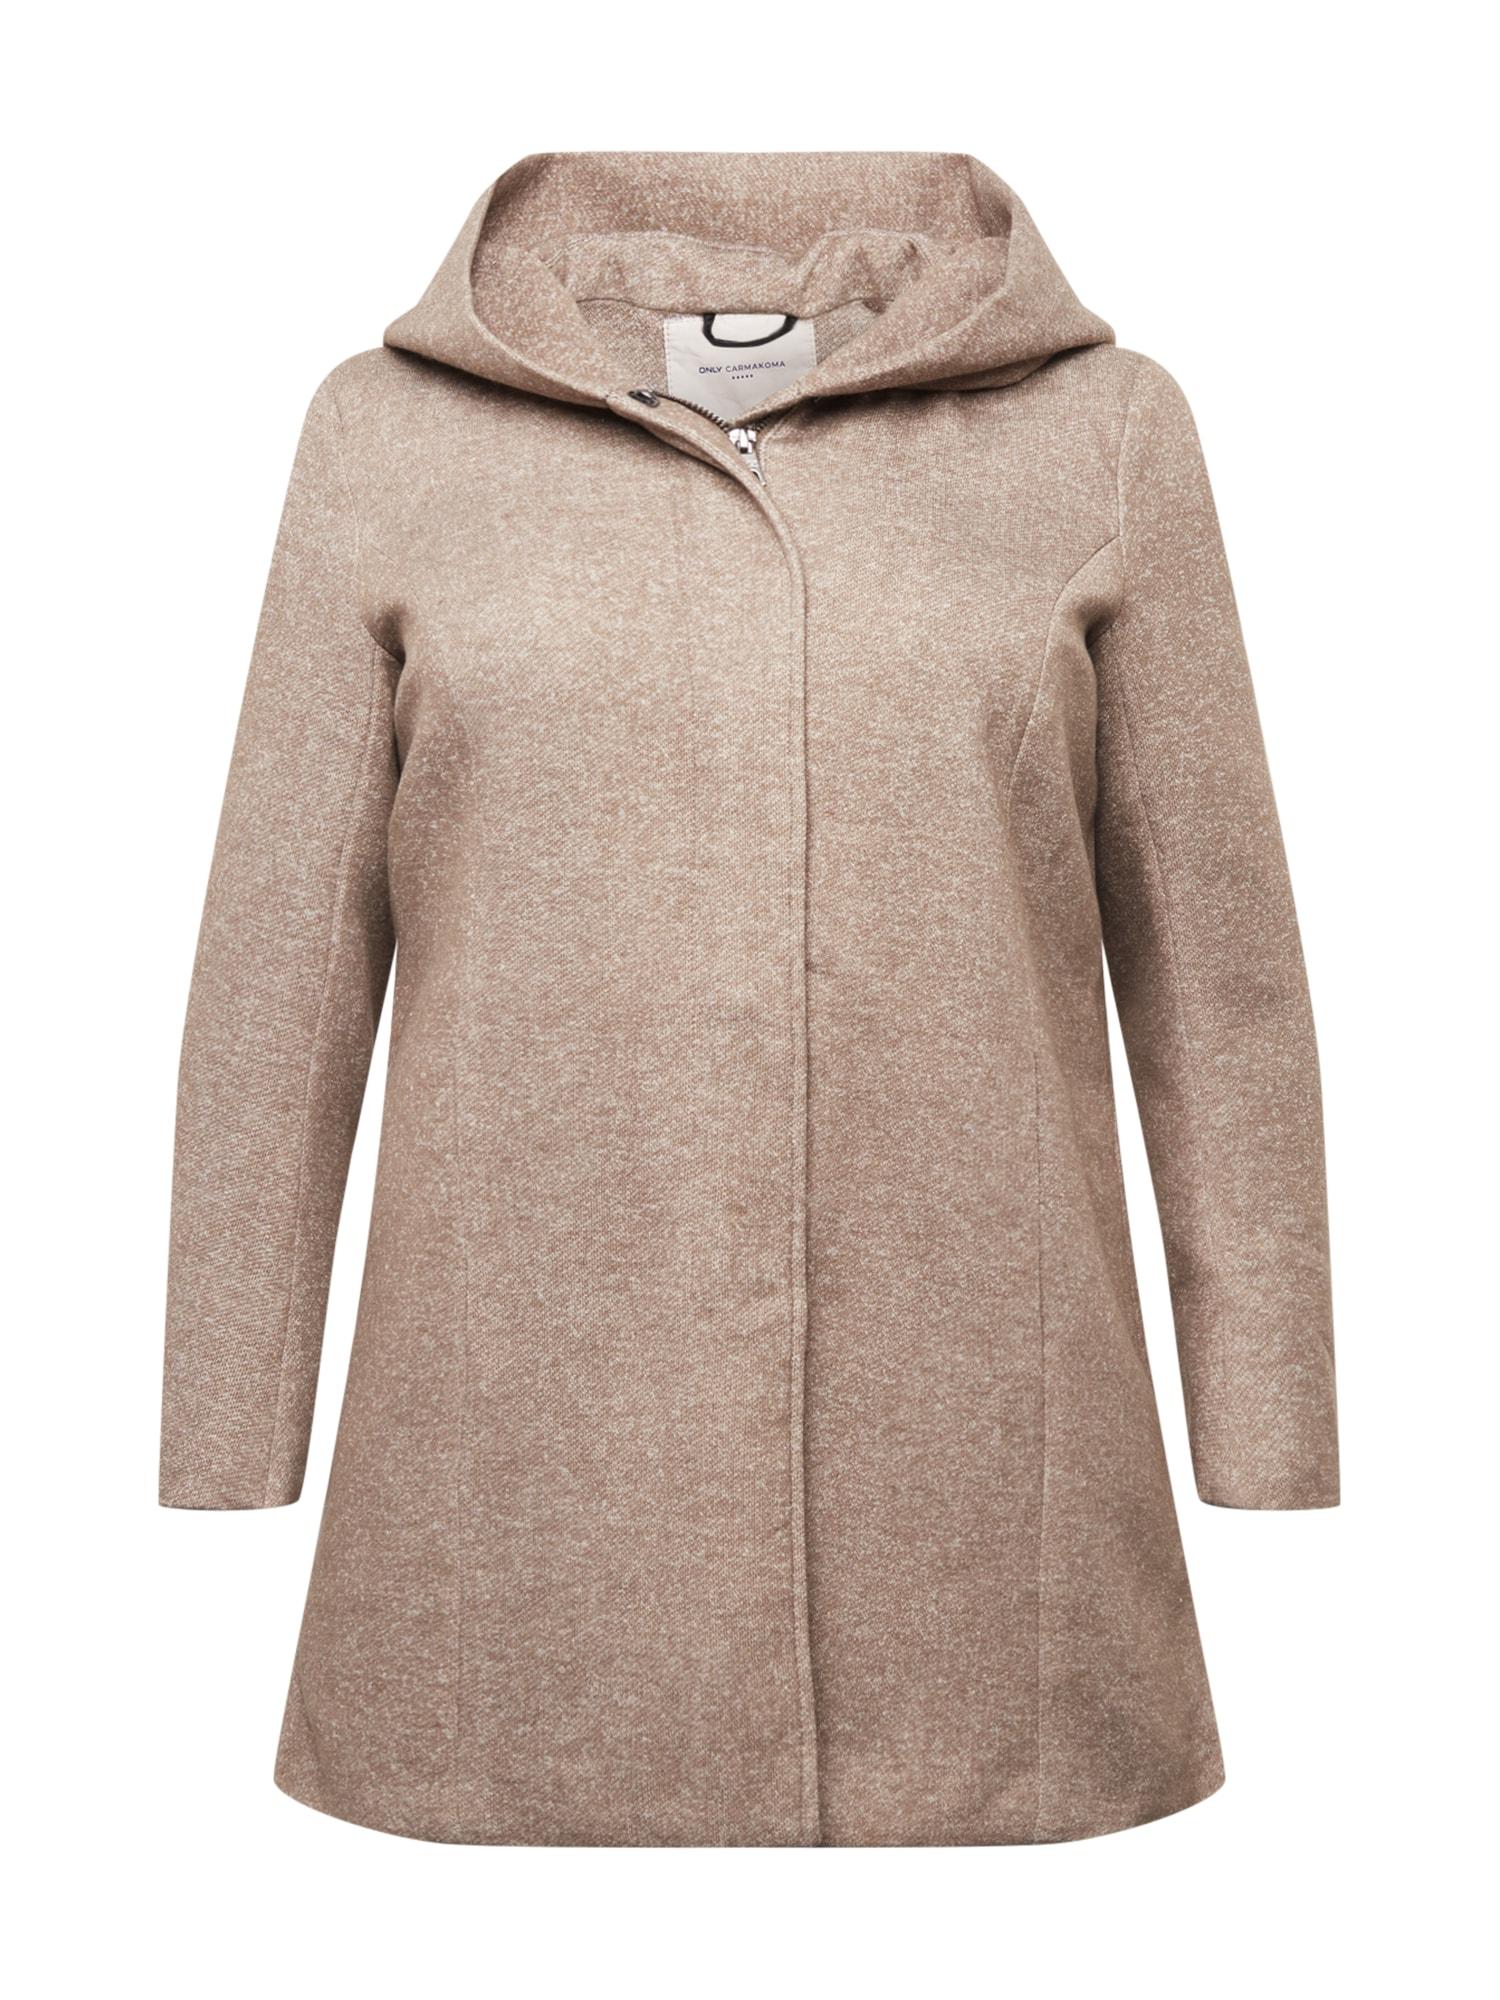 ONLY Carmakoma Demisezoninis paltas marga smėlio spalva